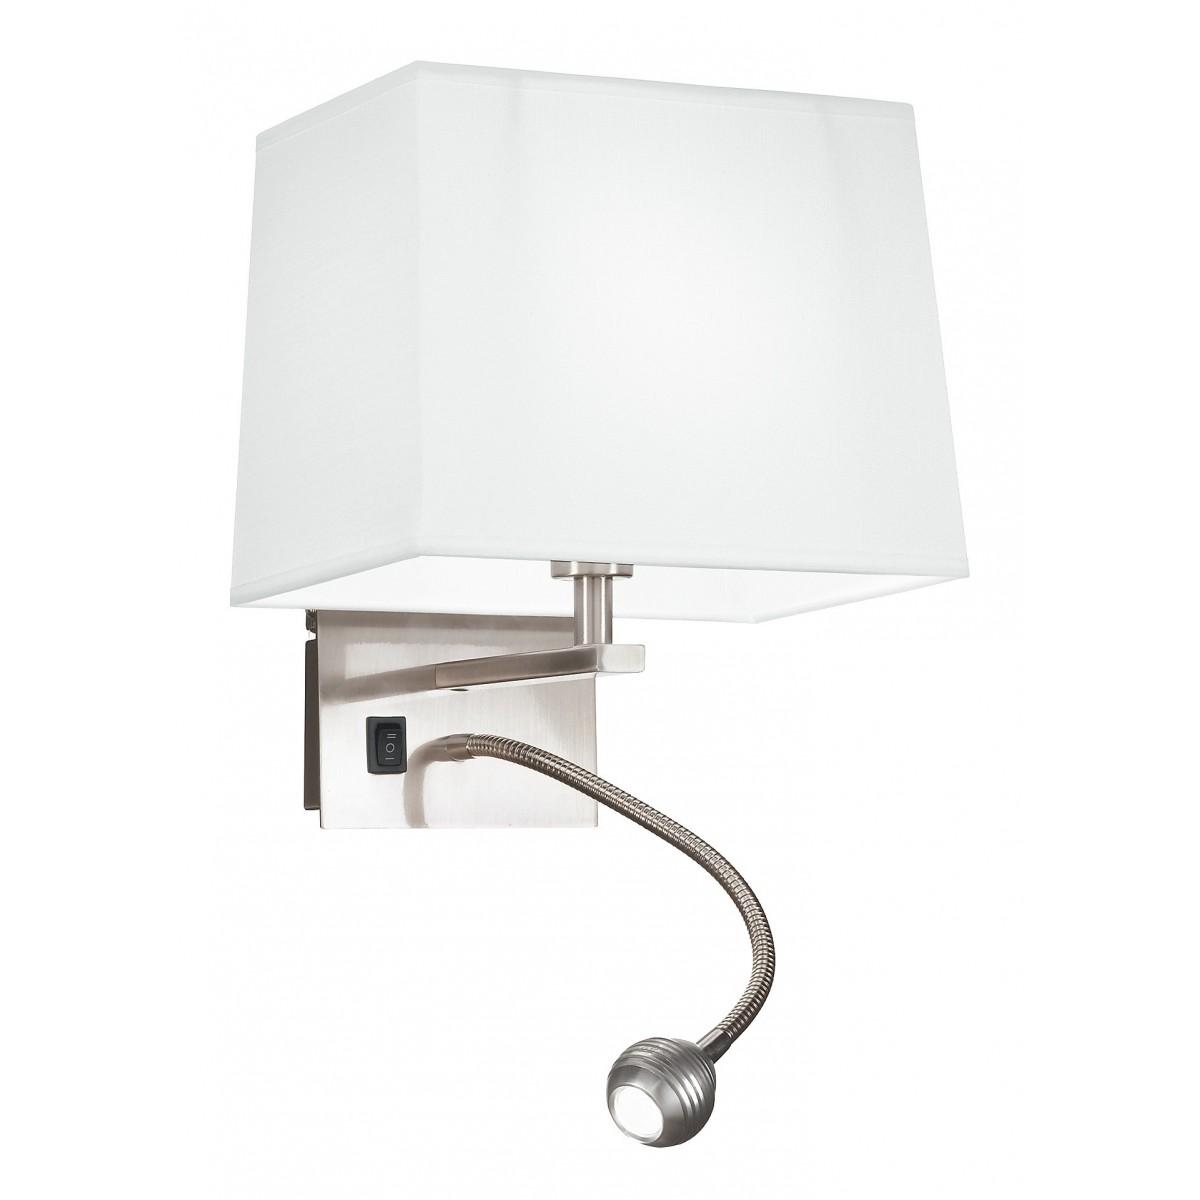 I-090111-5E - Applique Con Luce Led E Paralume Bianco 3 Watt 4500 Kelvin E14